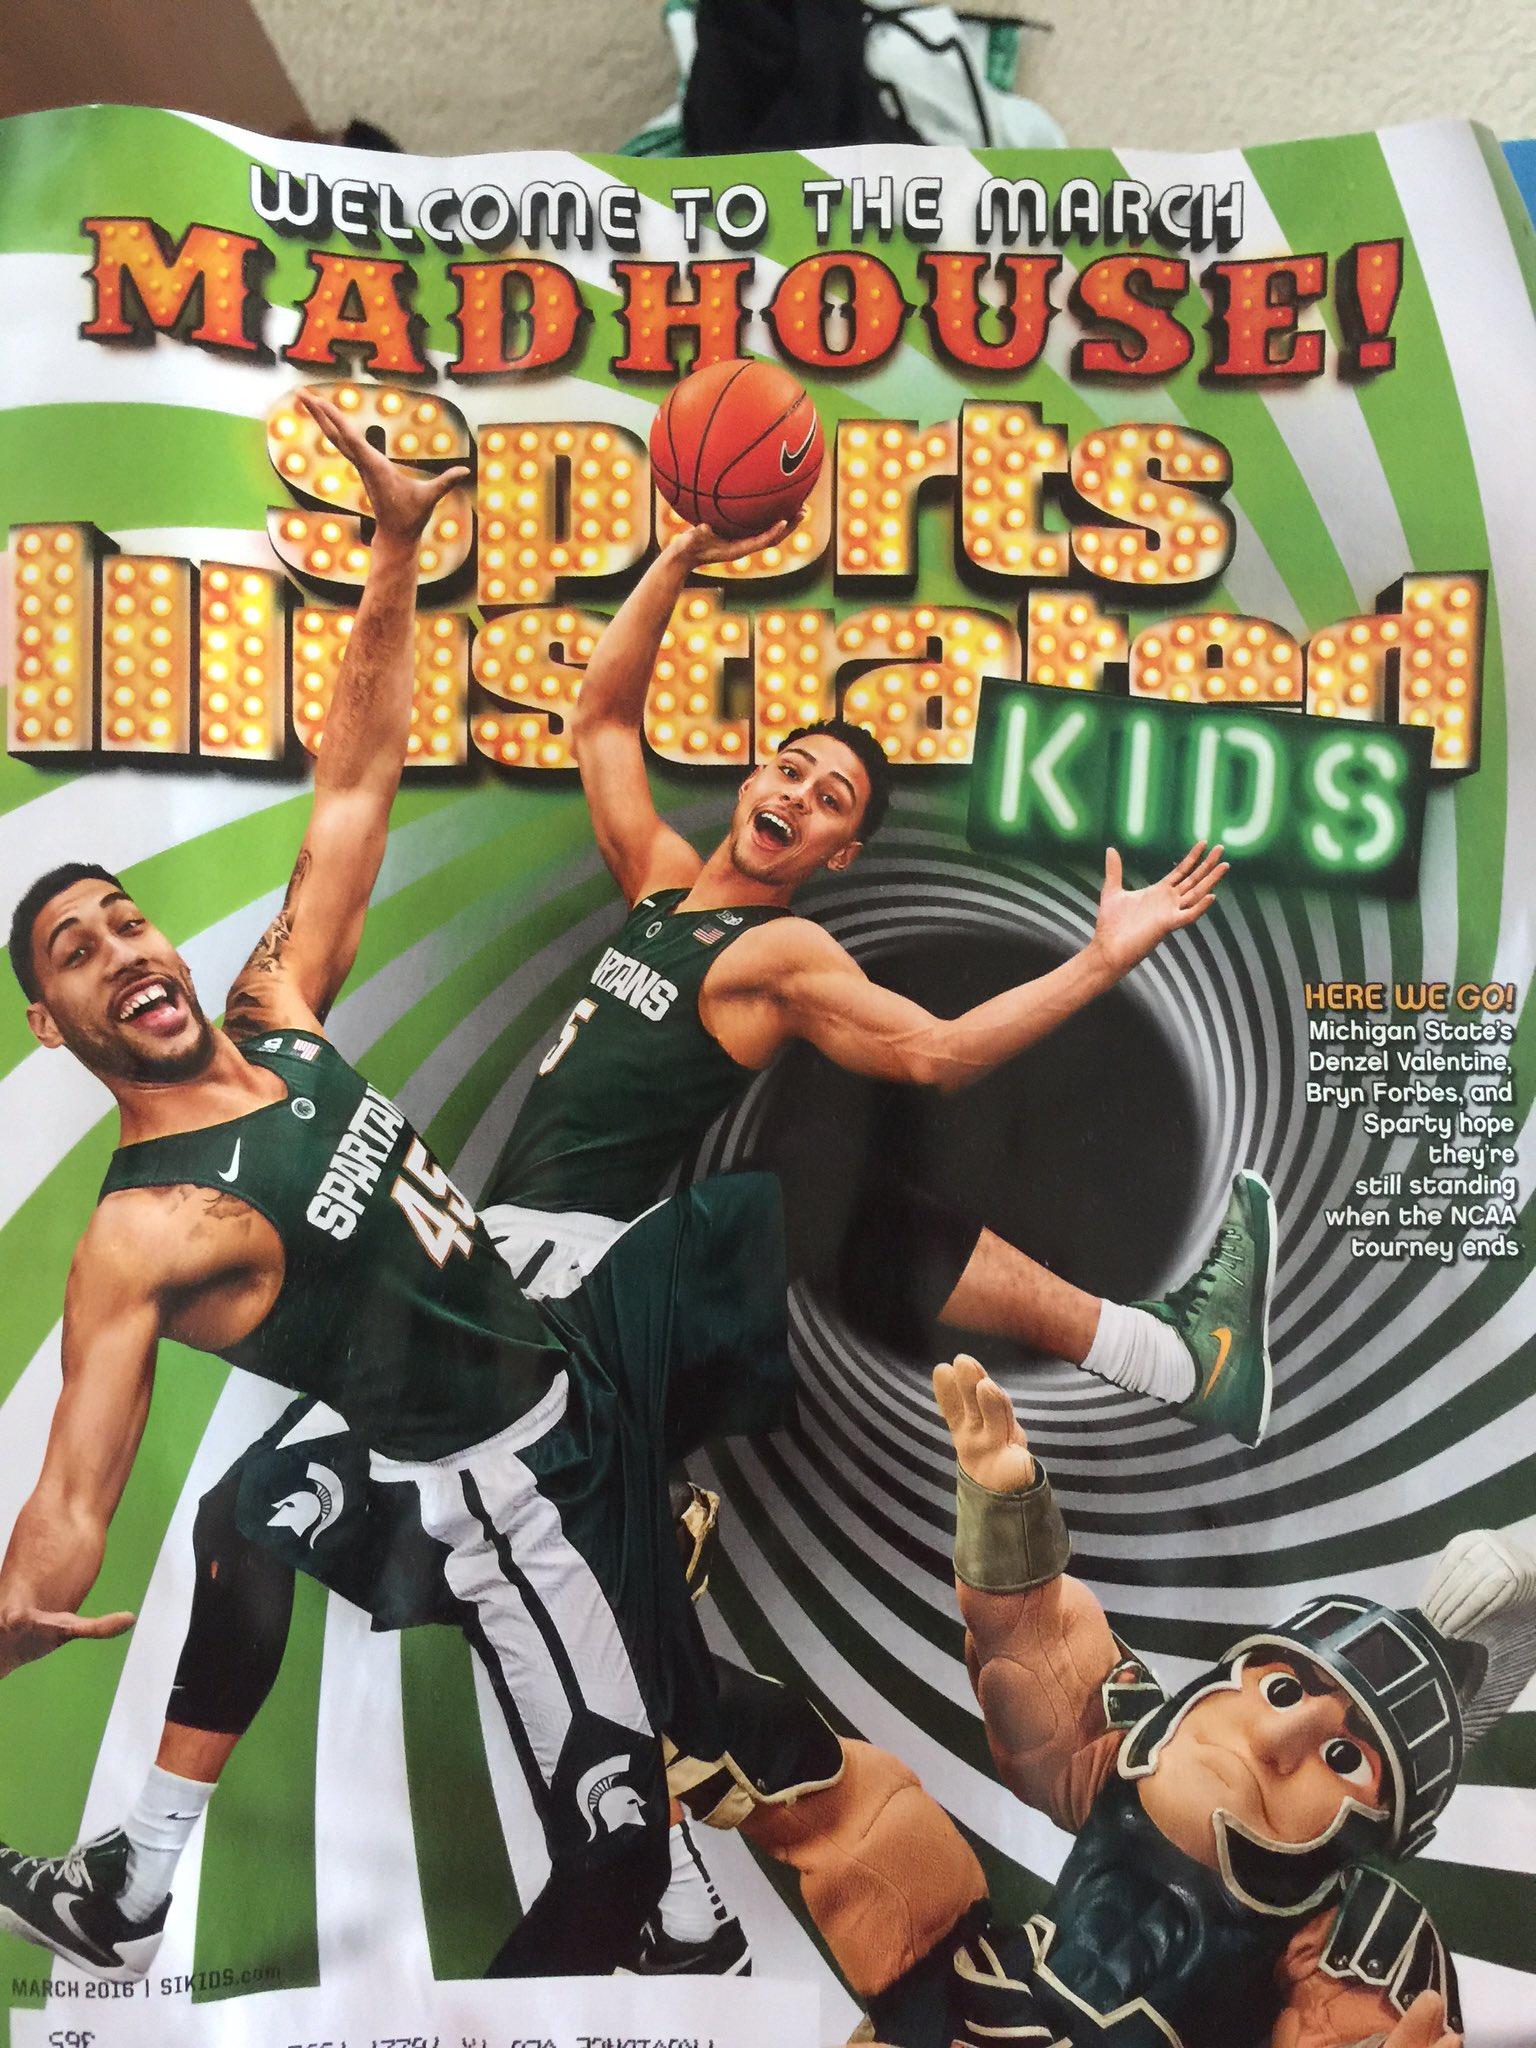 Sports Illustrated cover jinx - Wikipedia